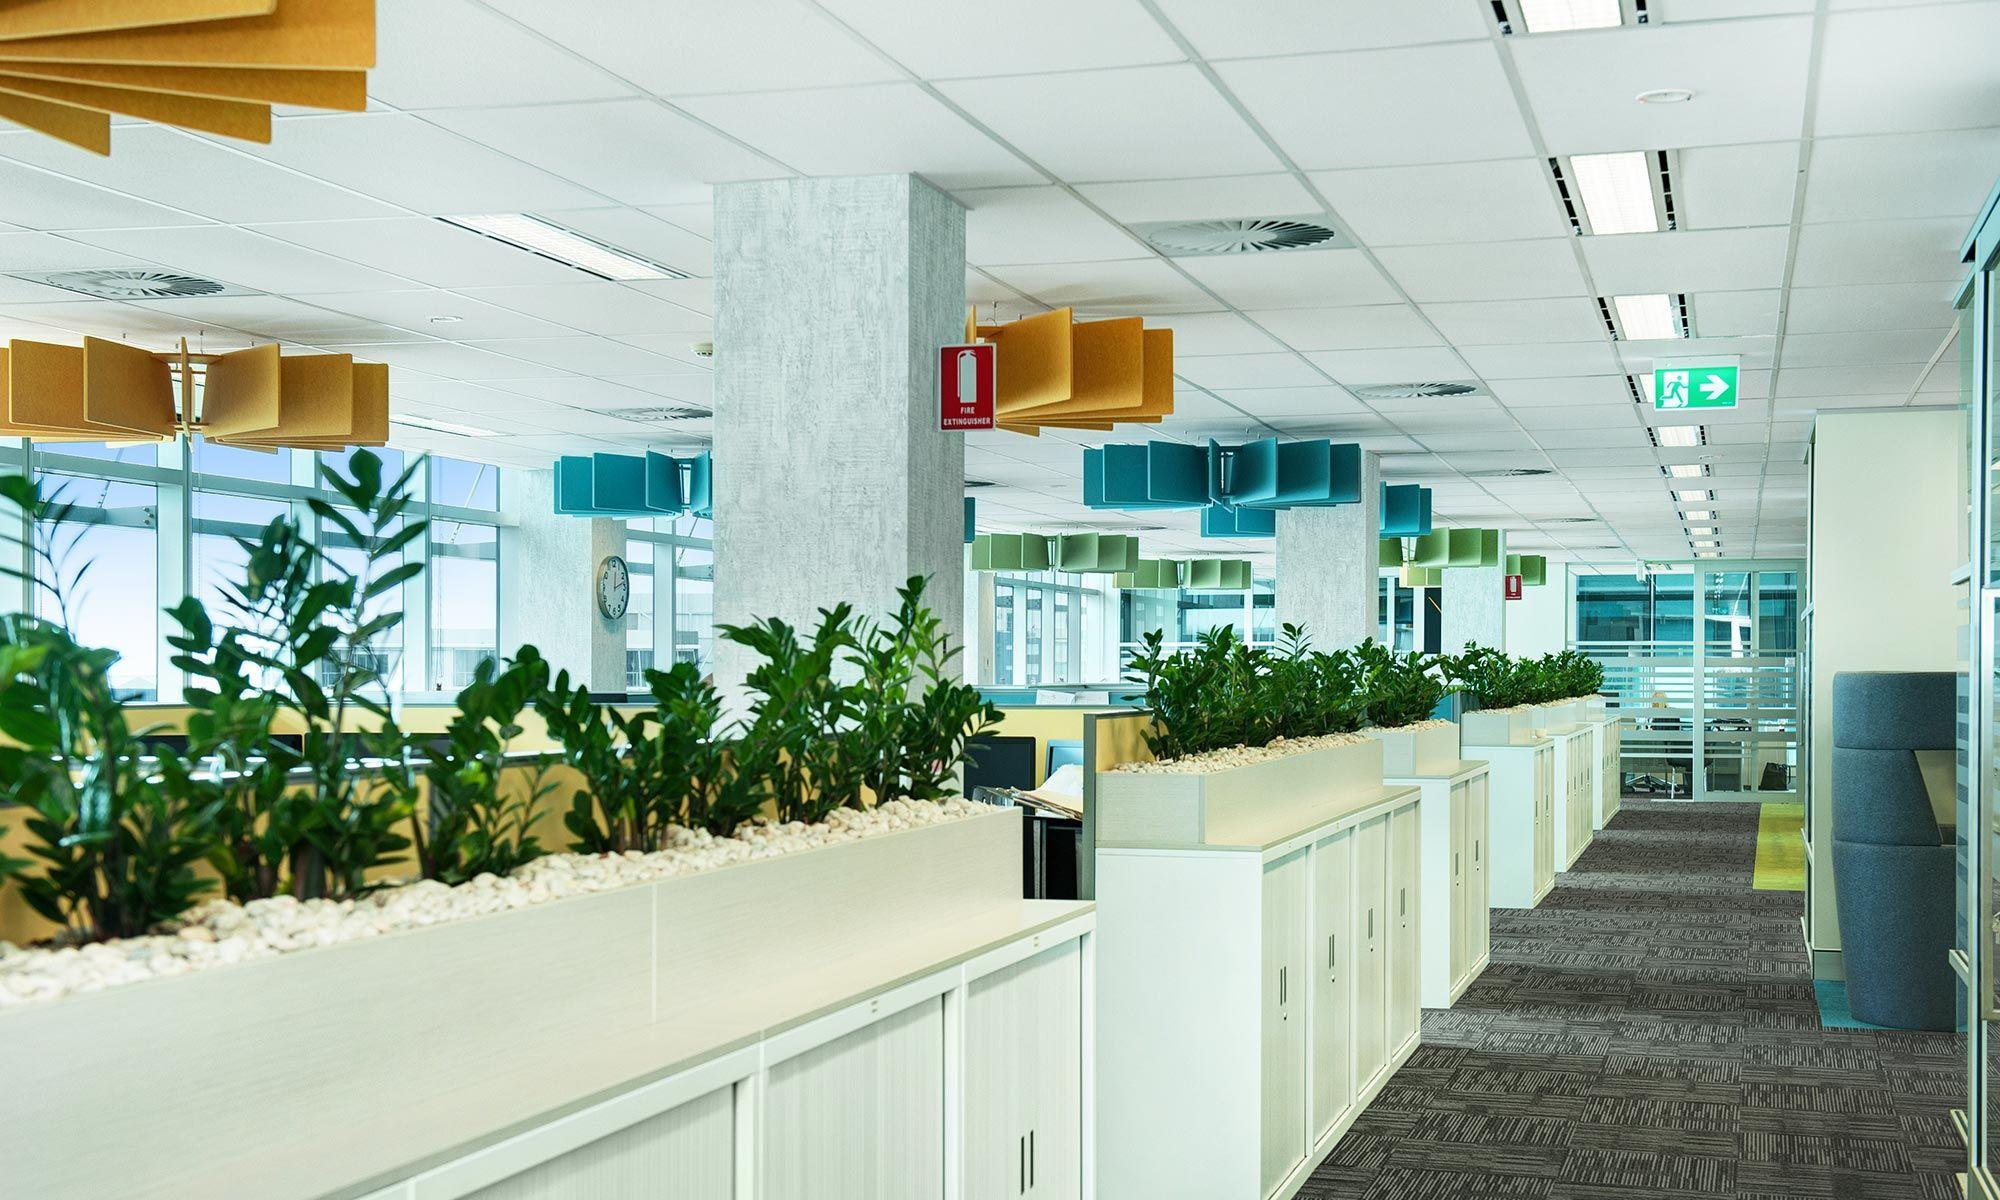 Planter materials